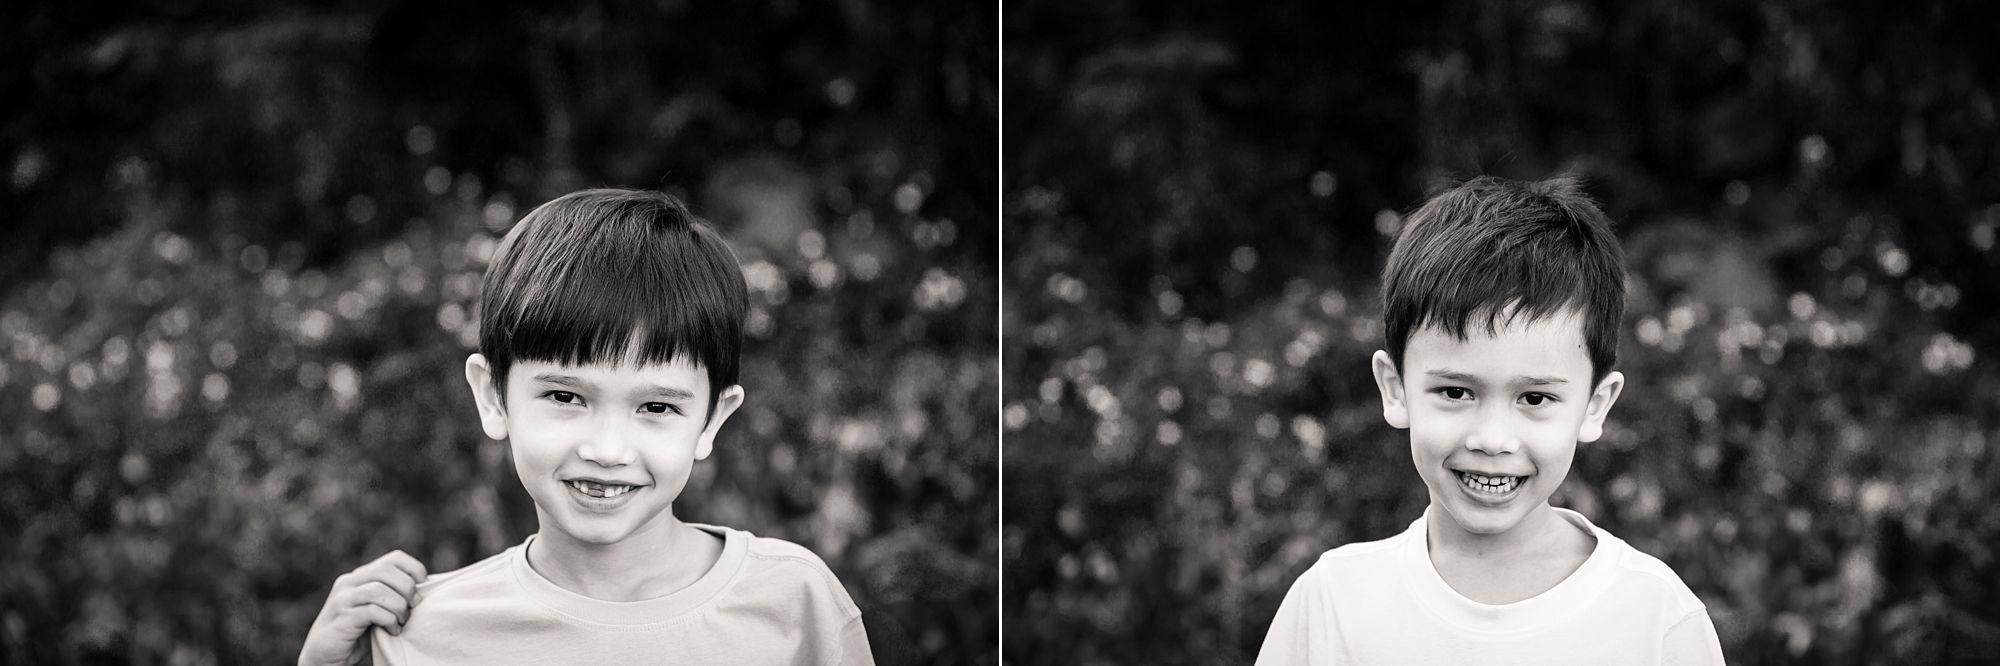 Taiwan_Family_Lifestyle_Photographer_Hunnicutt_Photography_0001